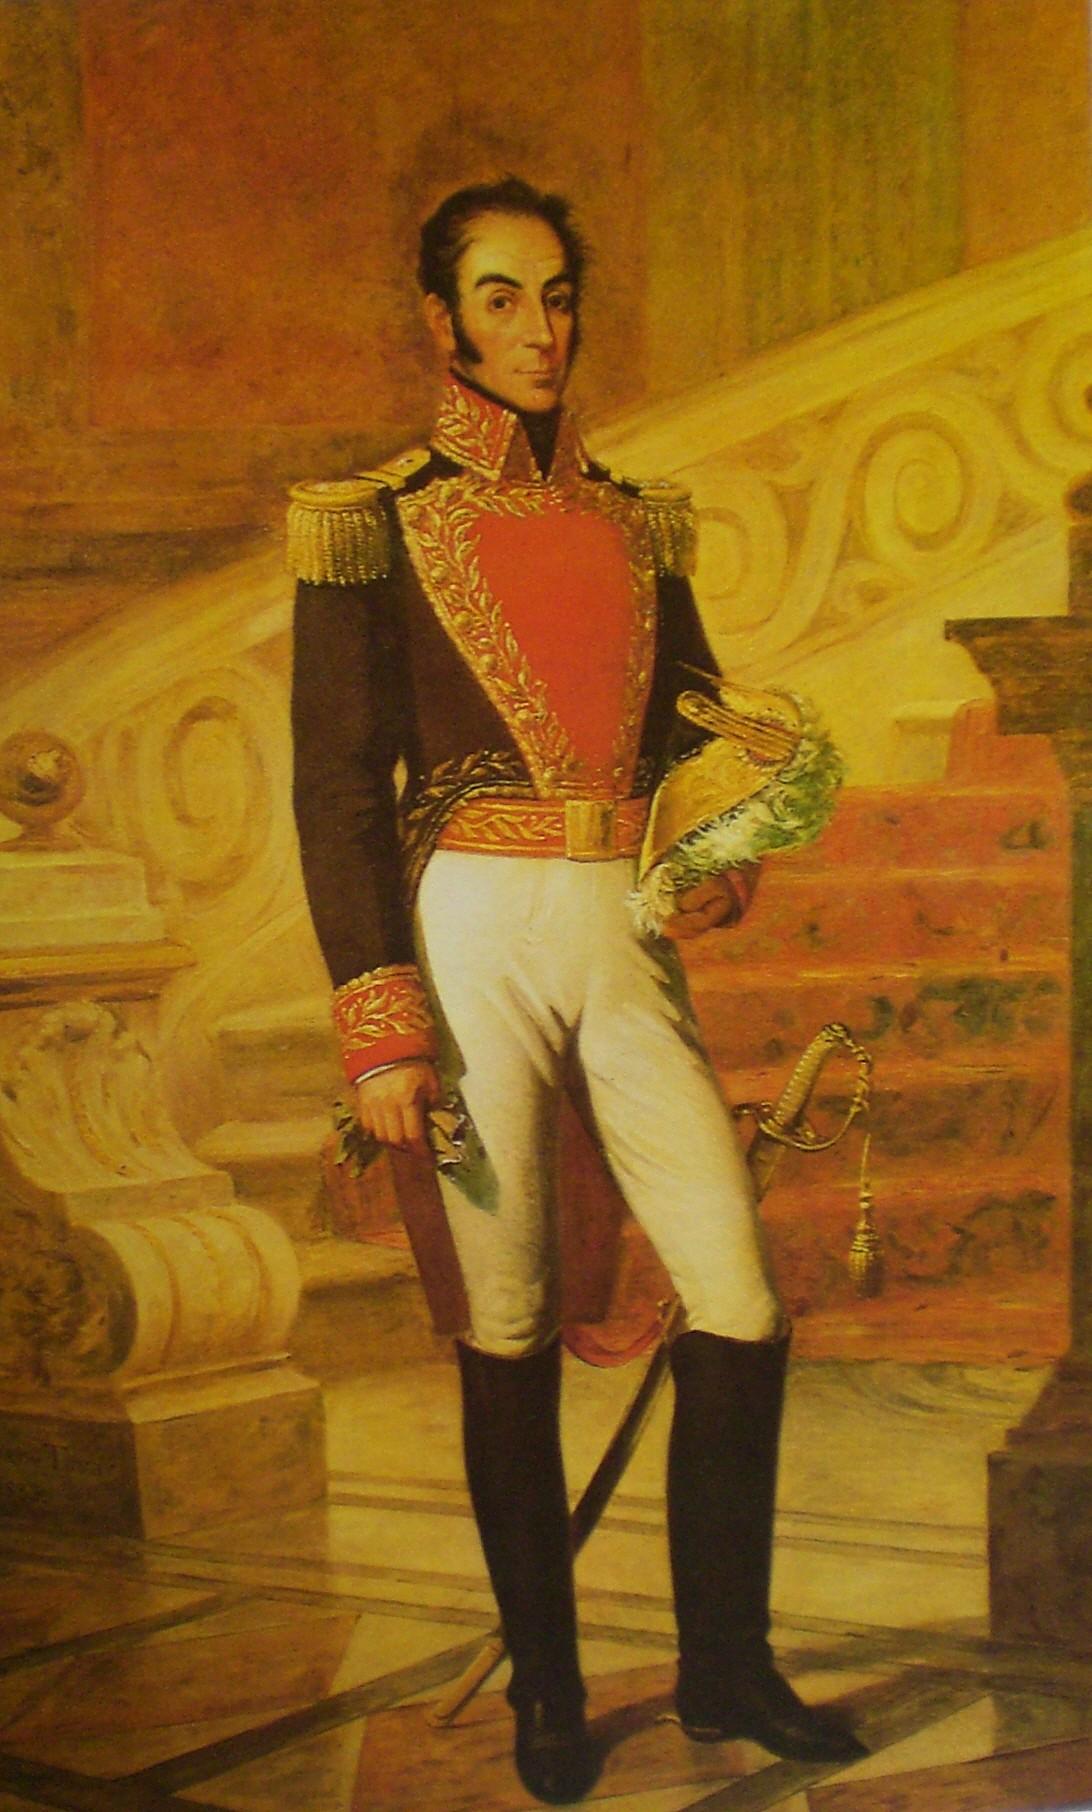 a biography of simon bolivar a venezuelan statesman and military leader Simón bolívar facts: simón bolívar (1783-1830) was a south american general and statesman who brought political independence to six present-day.